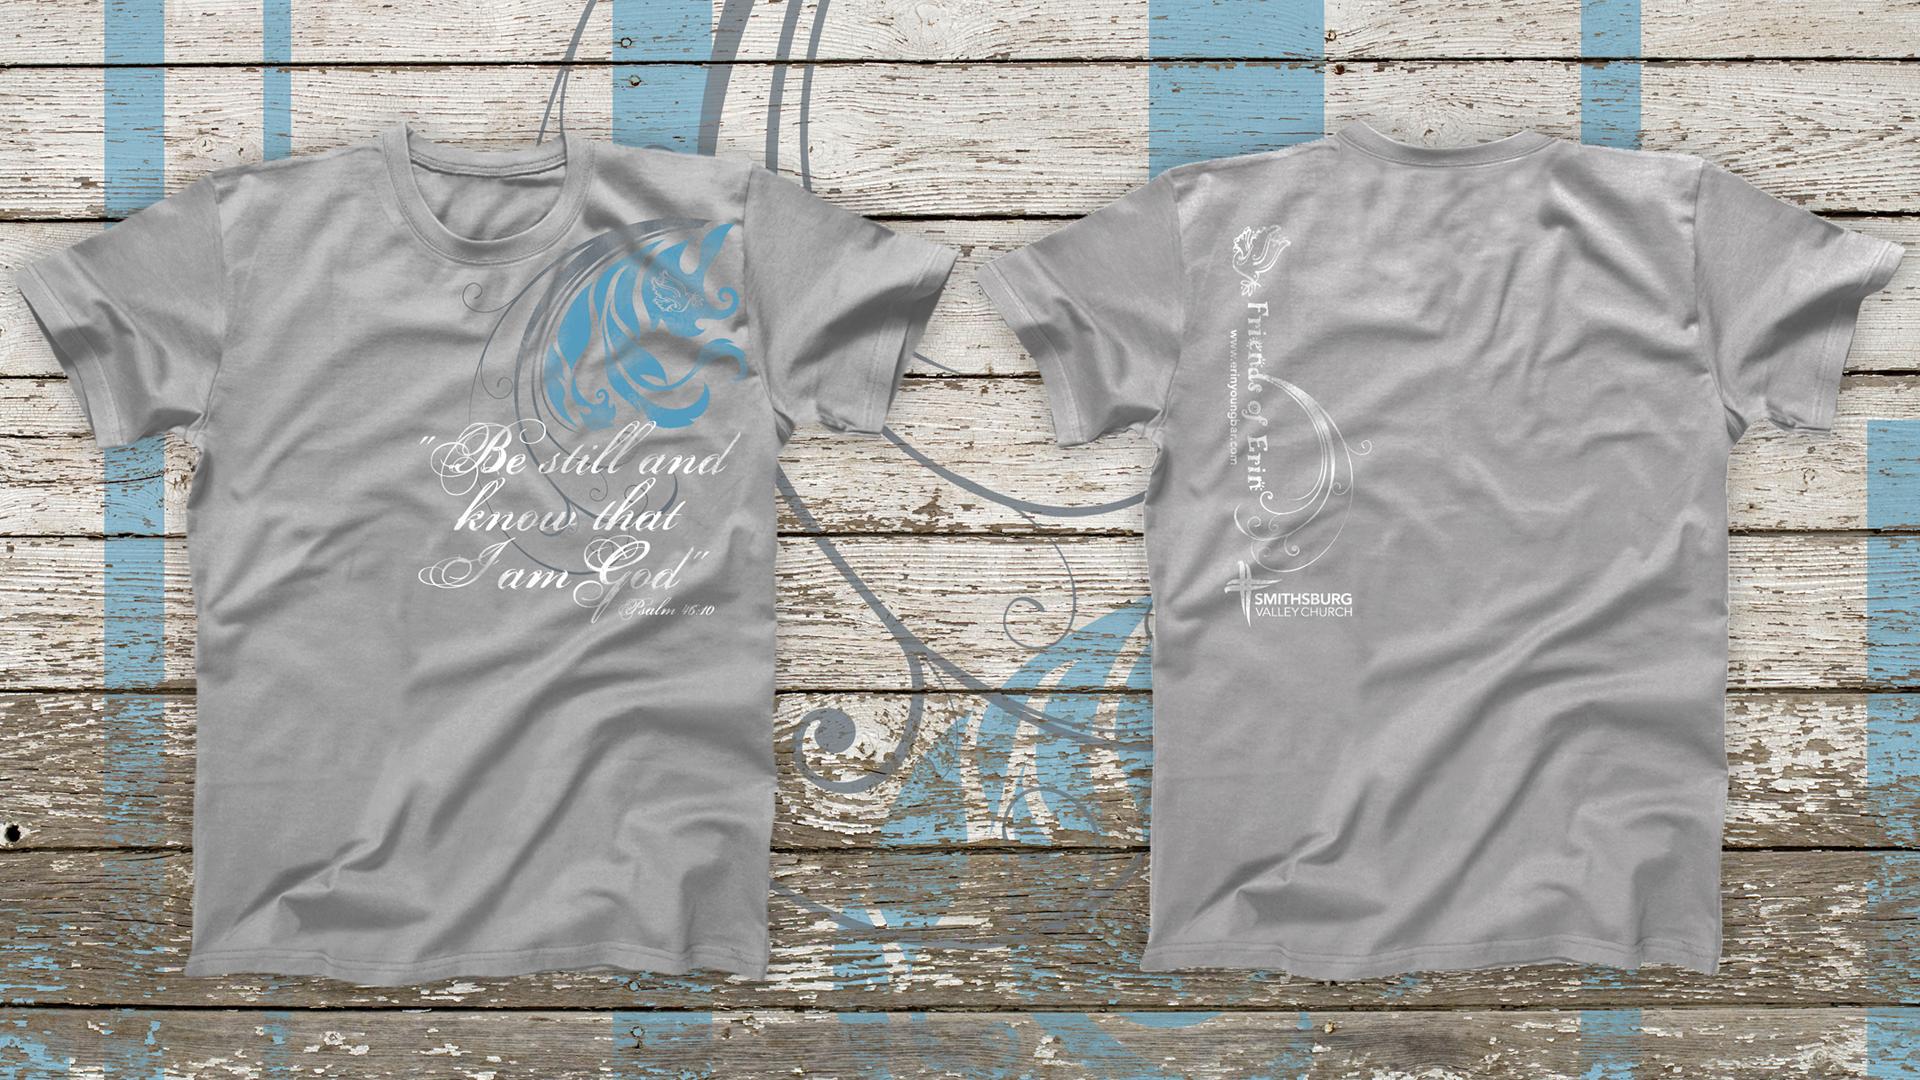 20130322-FriendsOfErin-Shirt-PROOF.png